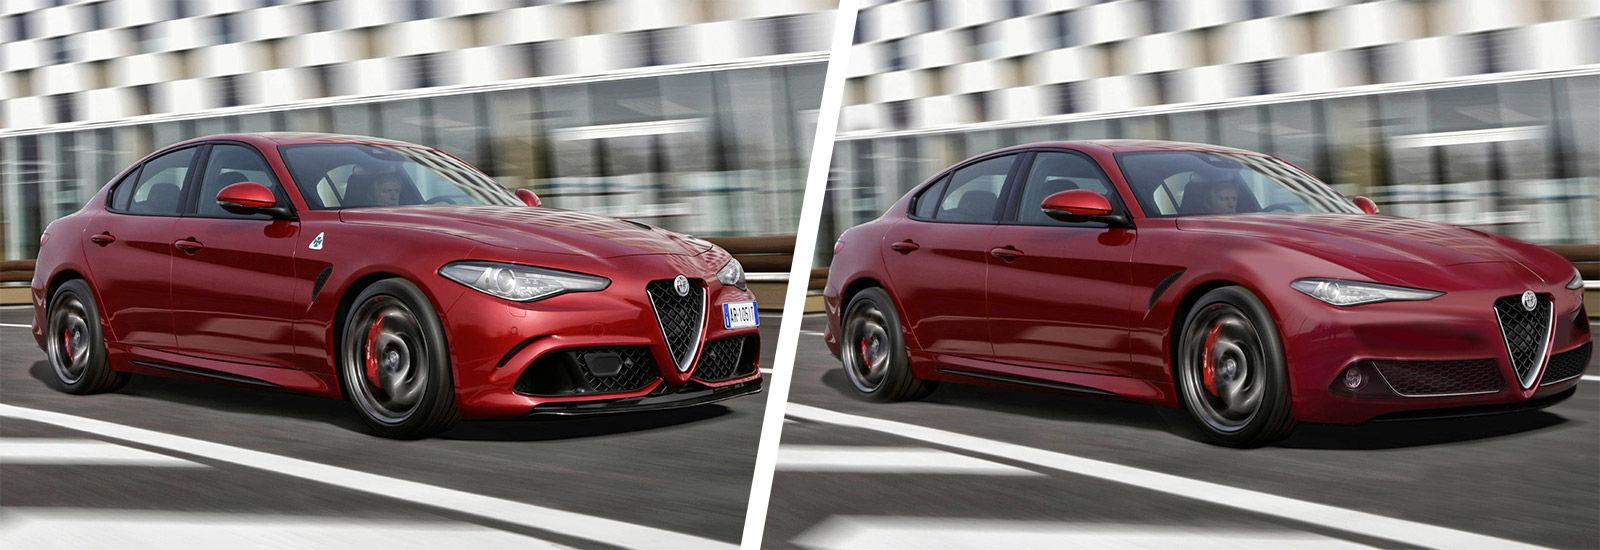 alfa romeo new car releasesAlfa Alfetta larger Giulia price specs release date  carwow